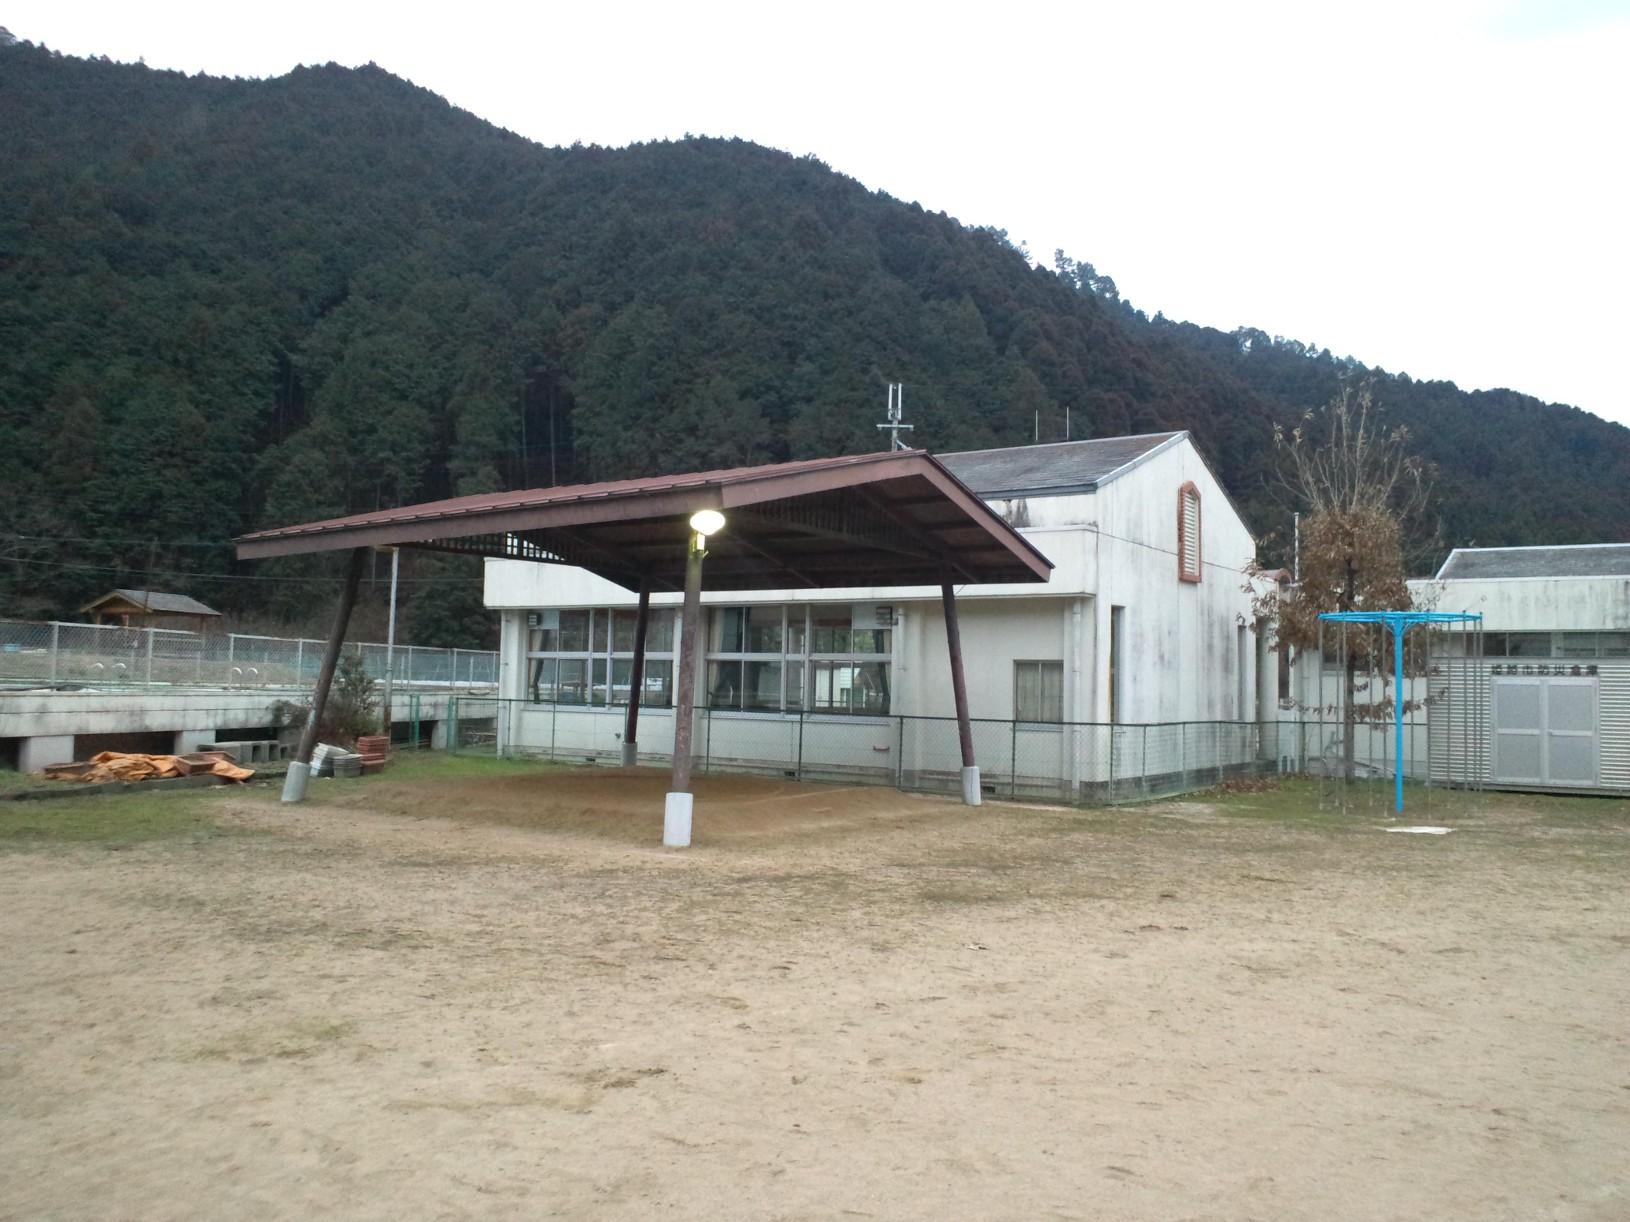 terrain de sumo